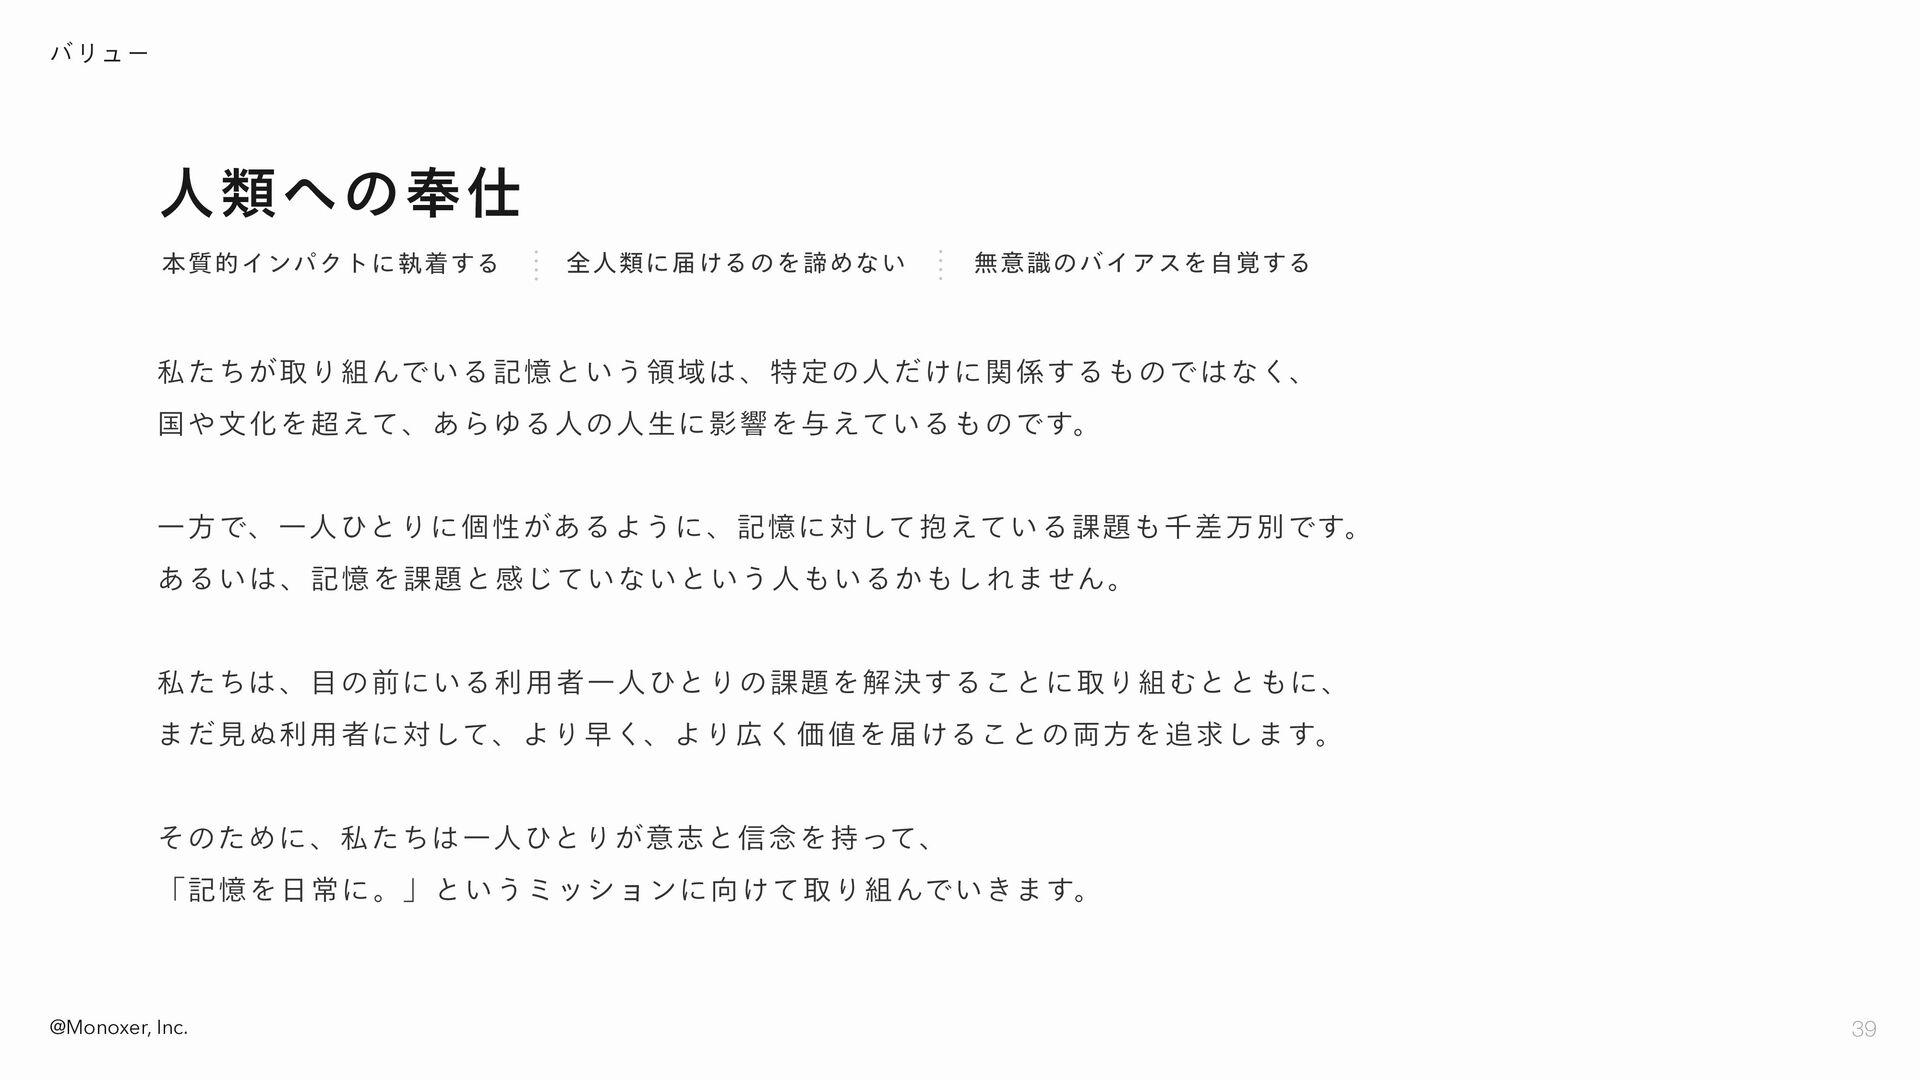 ืूཁ߲ @Monoxer, Inc. w ળྑ w ݠڏ w Ժ͔ w ֶशҙཉ͕ߴ...